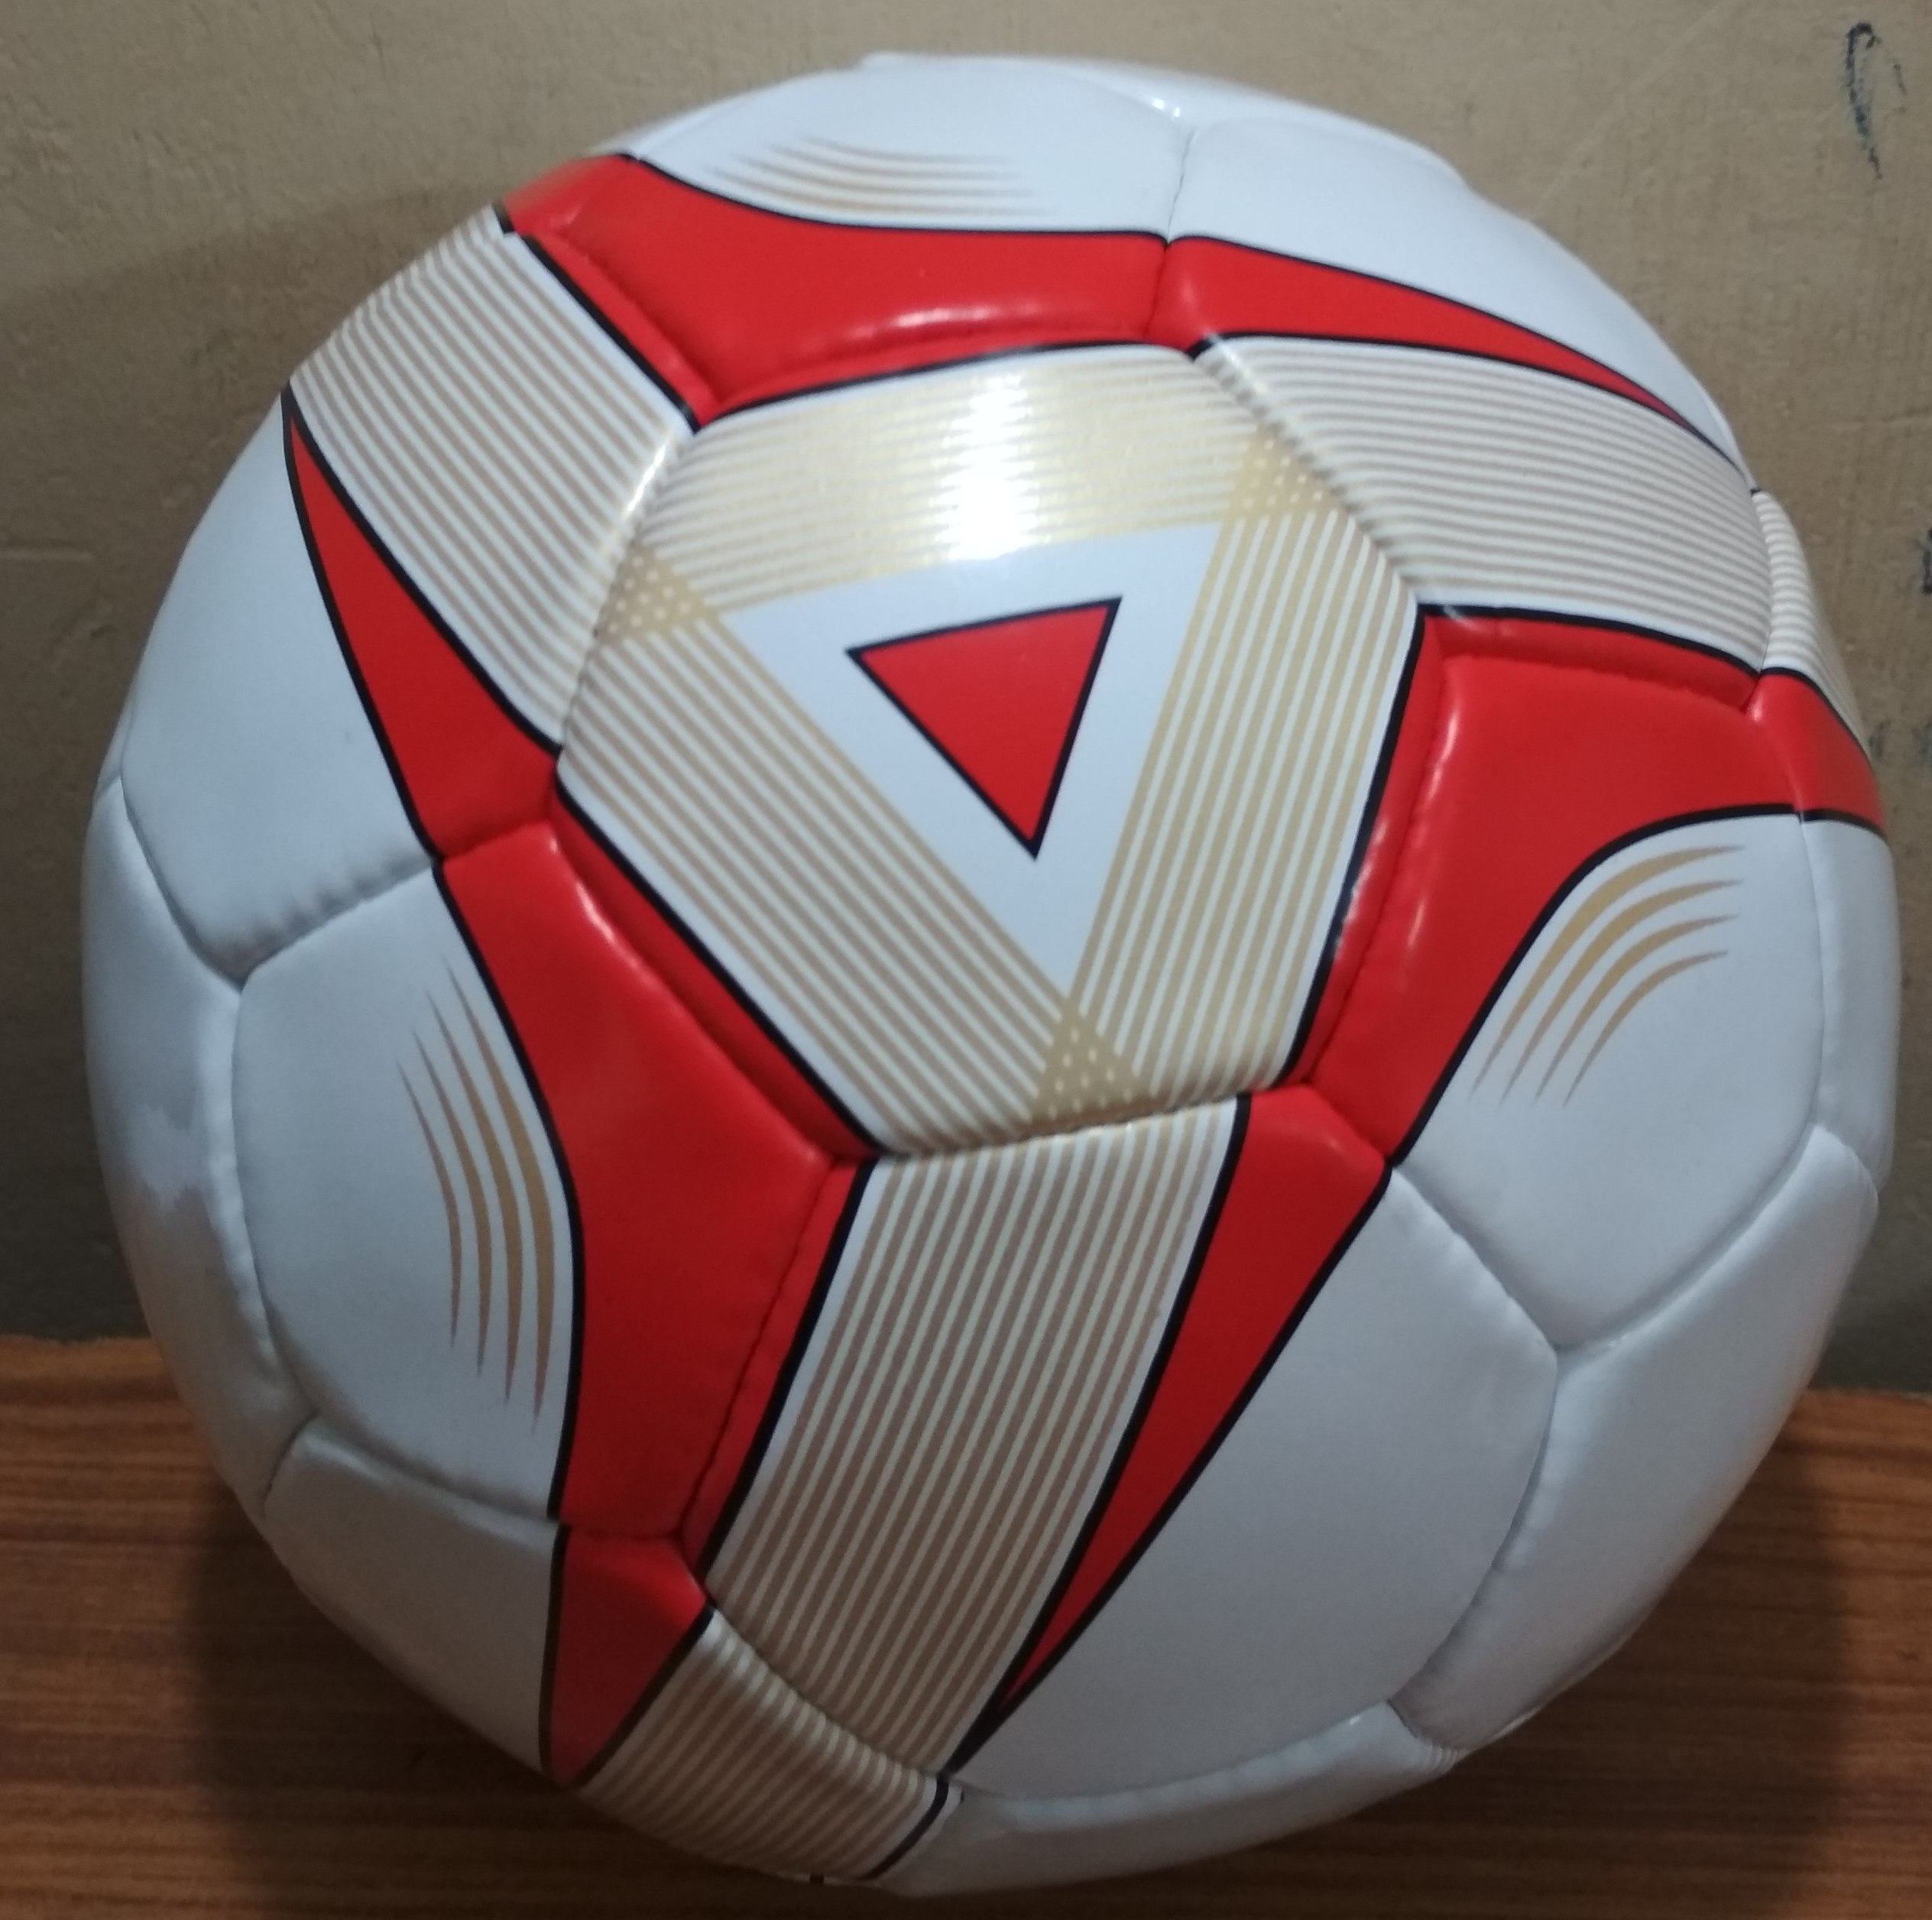 Foot Ball Anurupa Star No.5 Synthetic (Glossy)